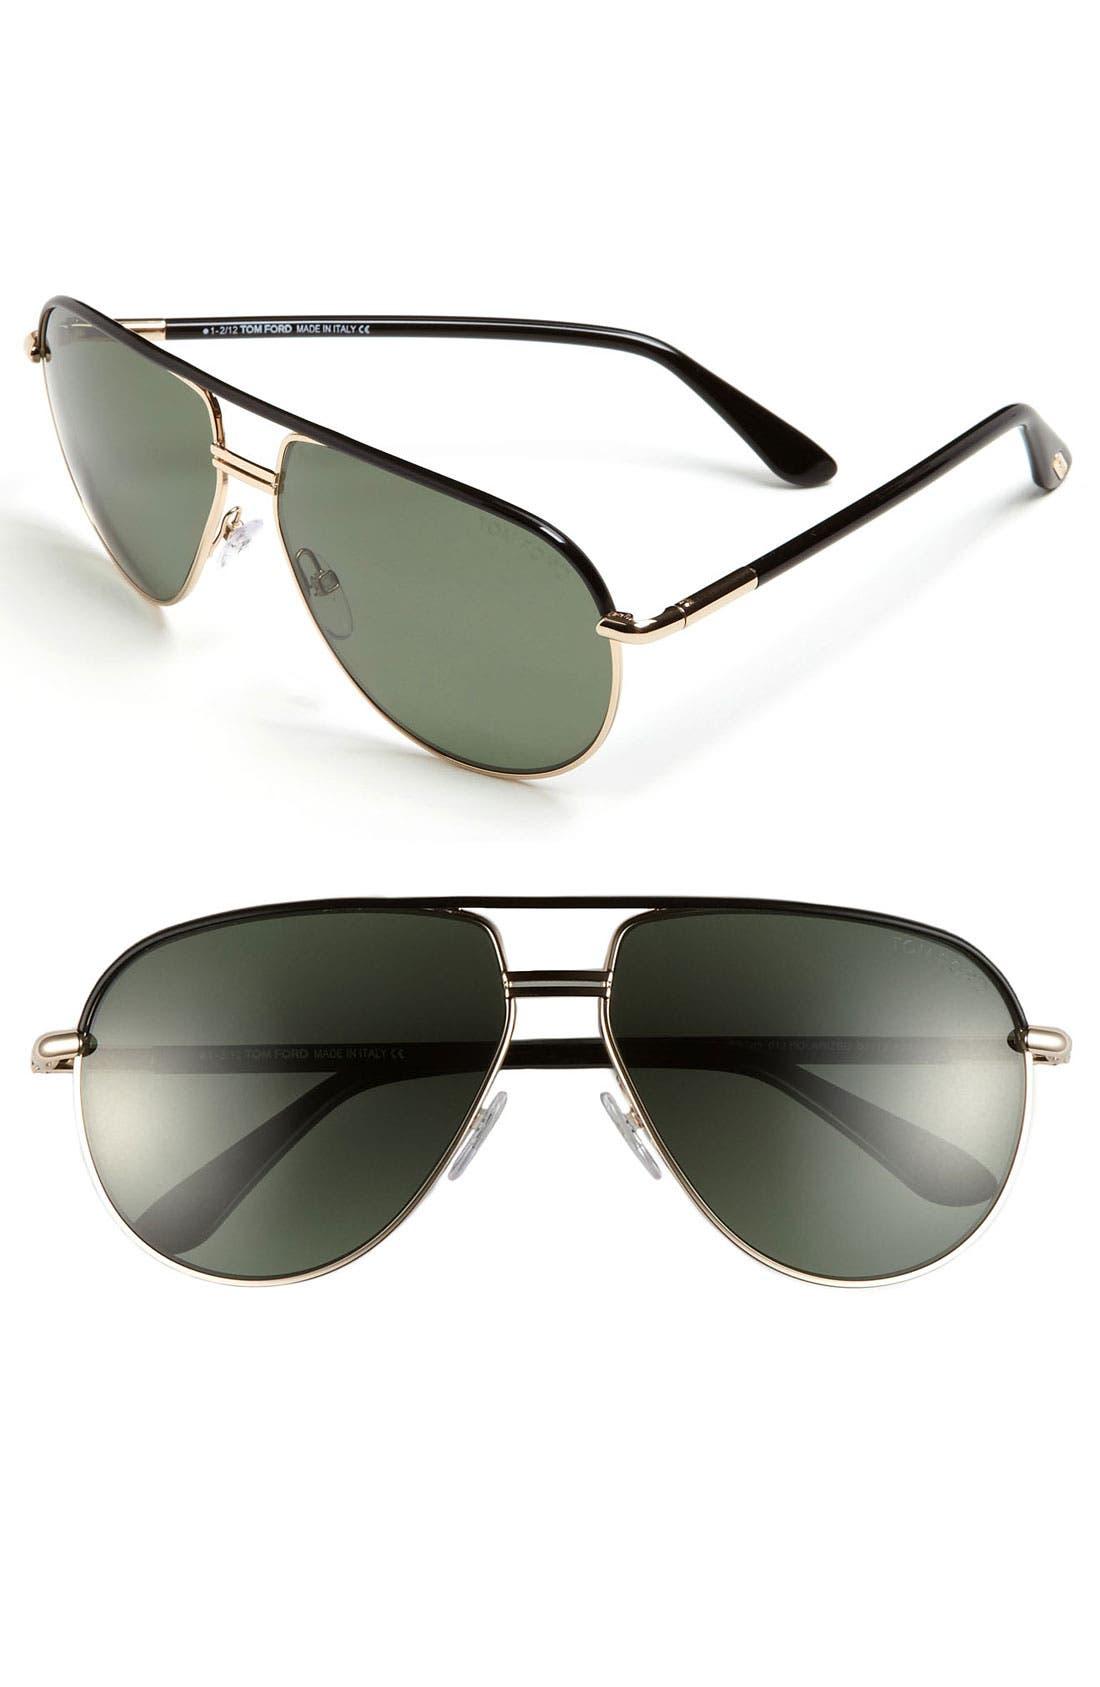 Main Image - Tom Ford 'Cole' 61mm Polarized Aviator Sunglasses